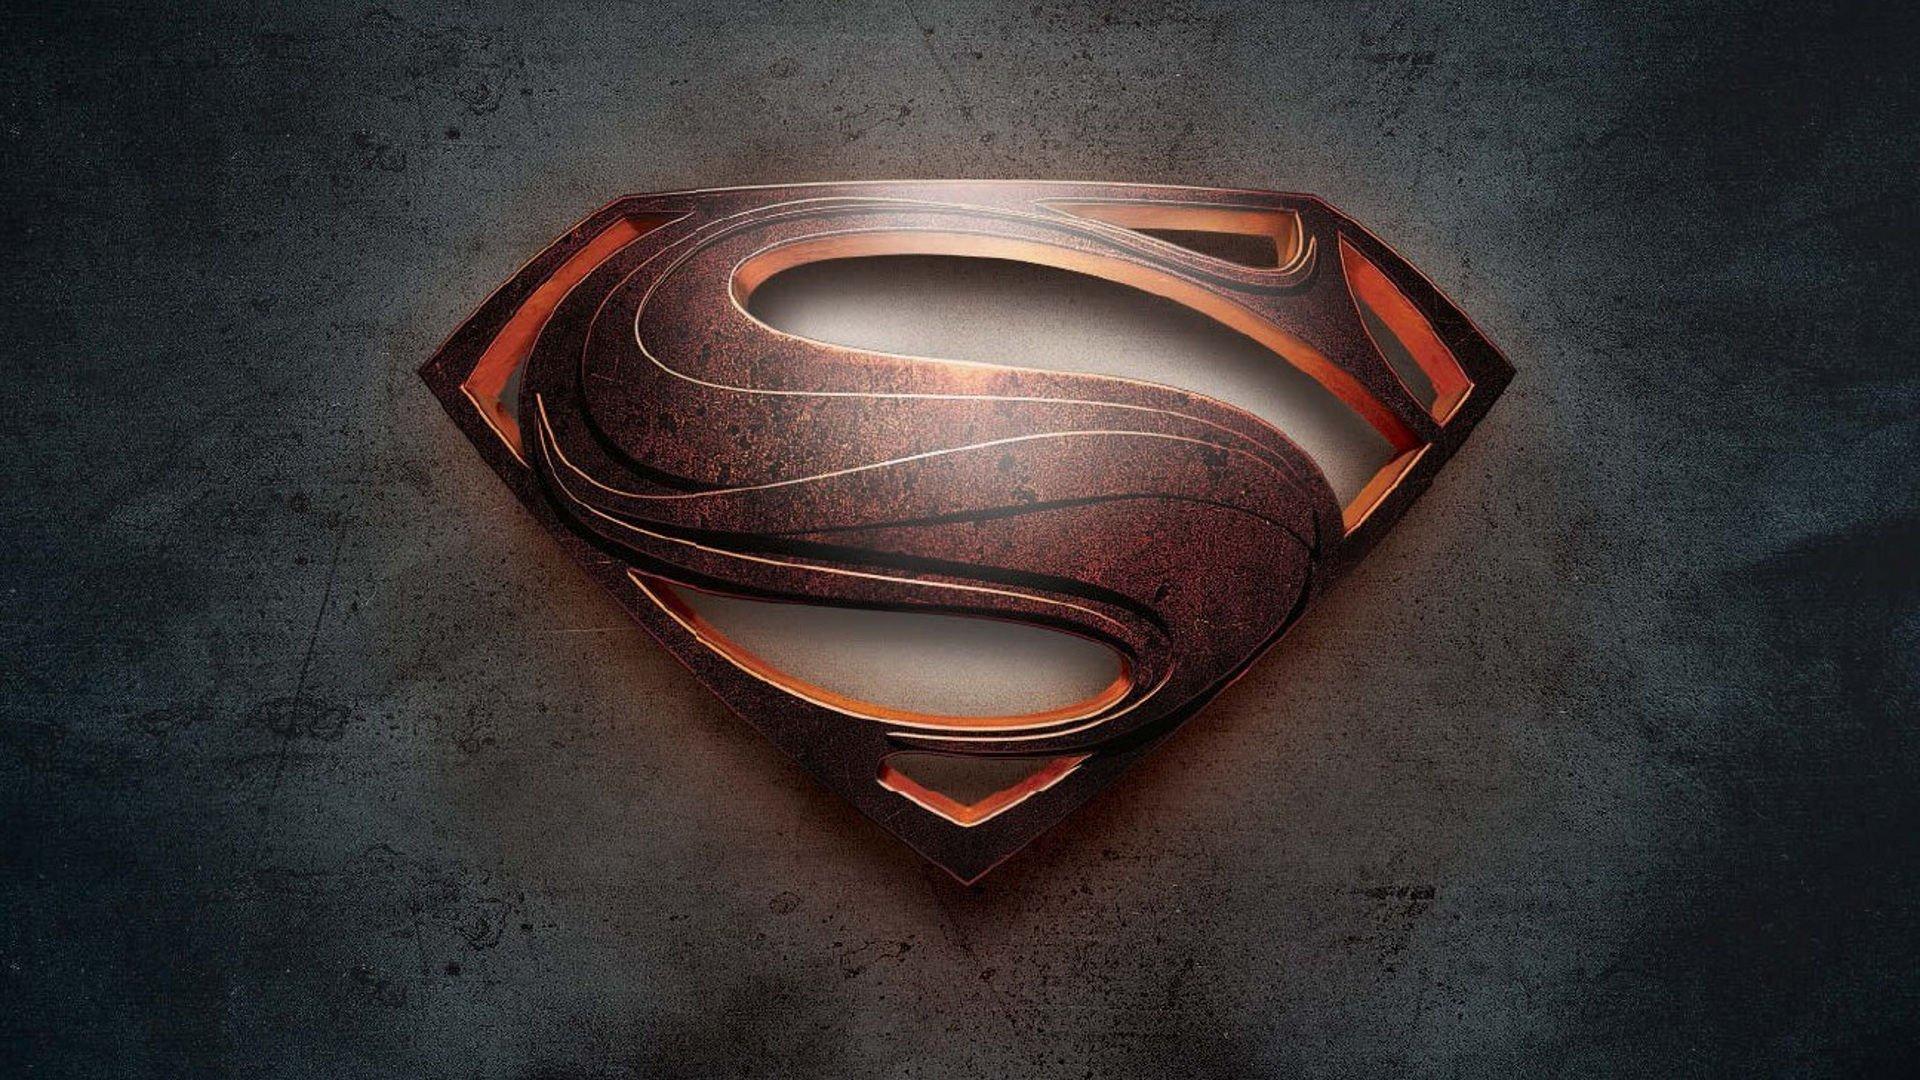 Superman Logo desktop backgrounds Background HD Wallpaper for 1920x1080